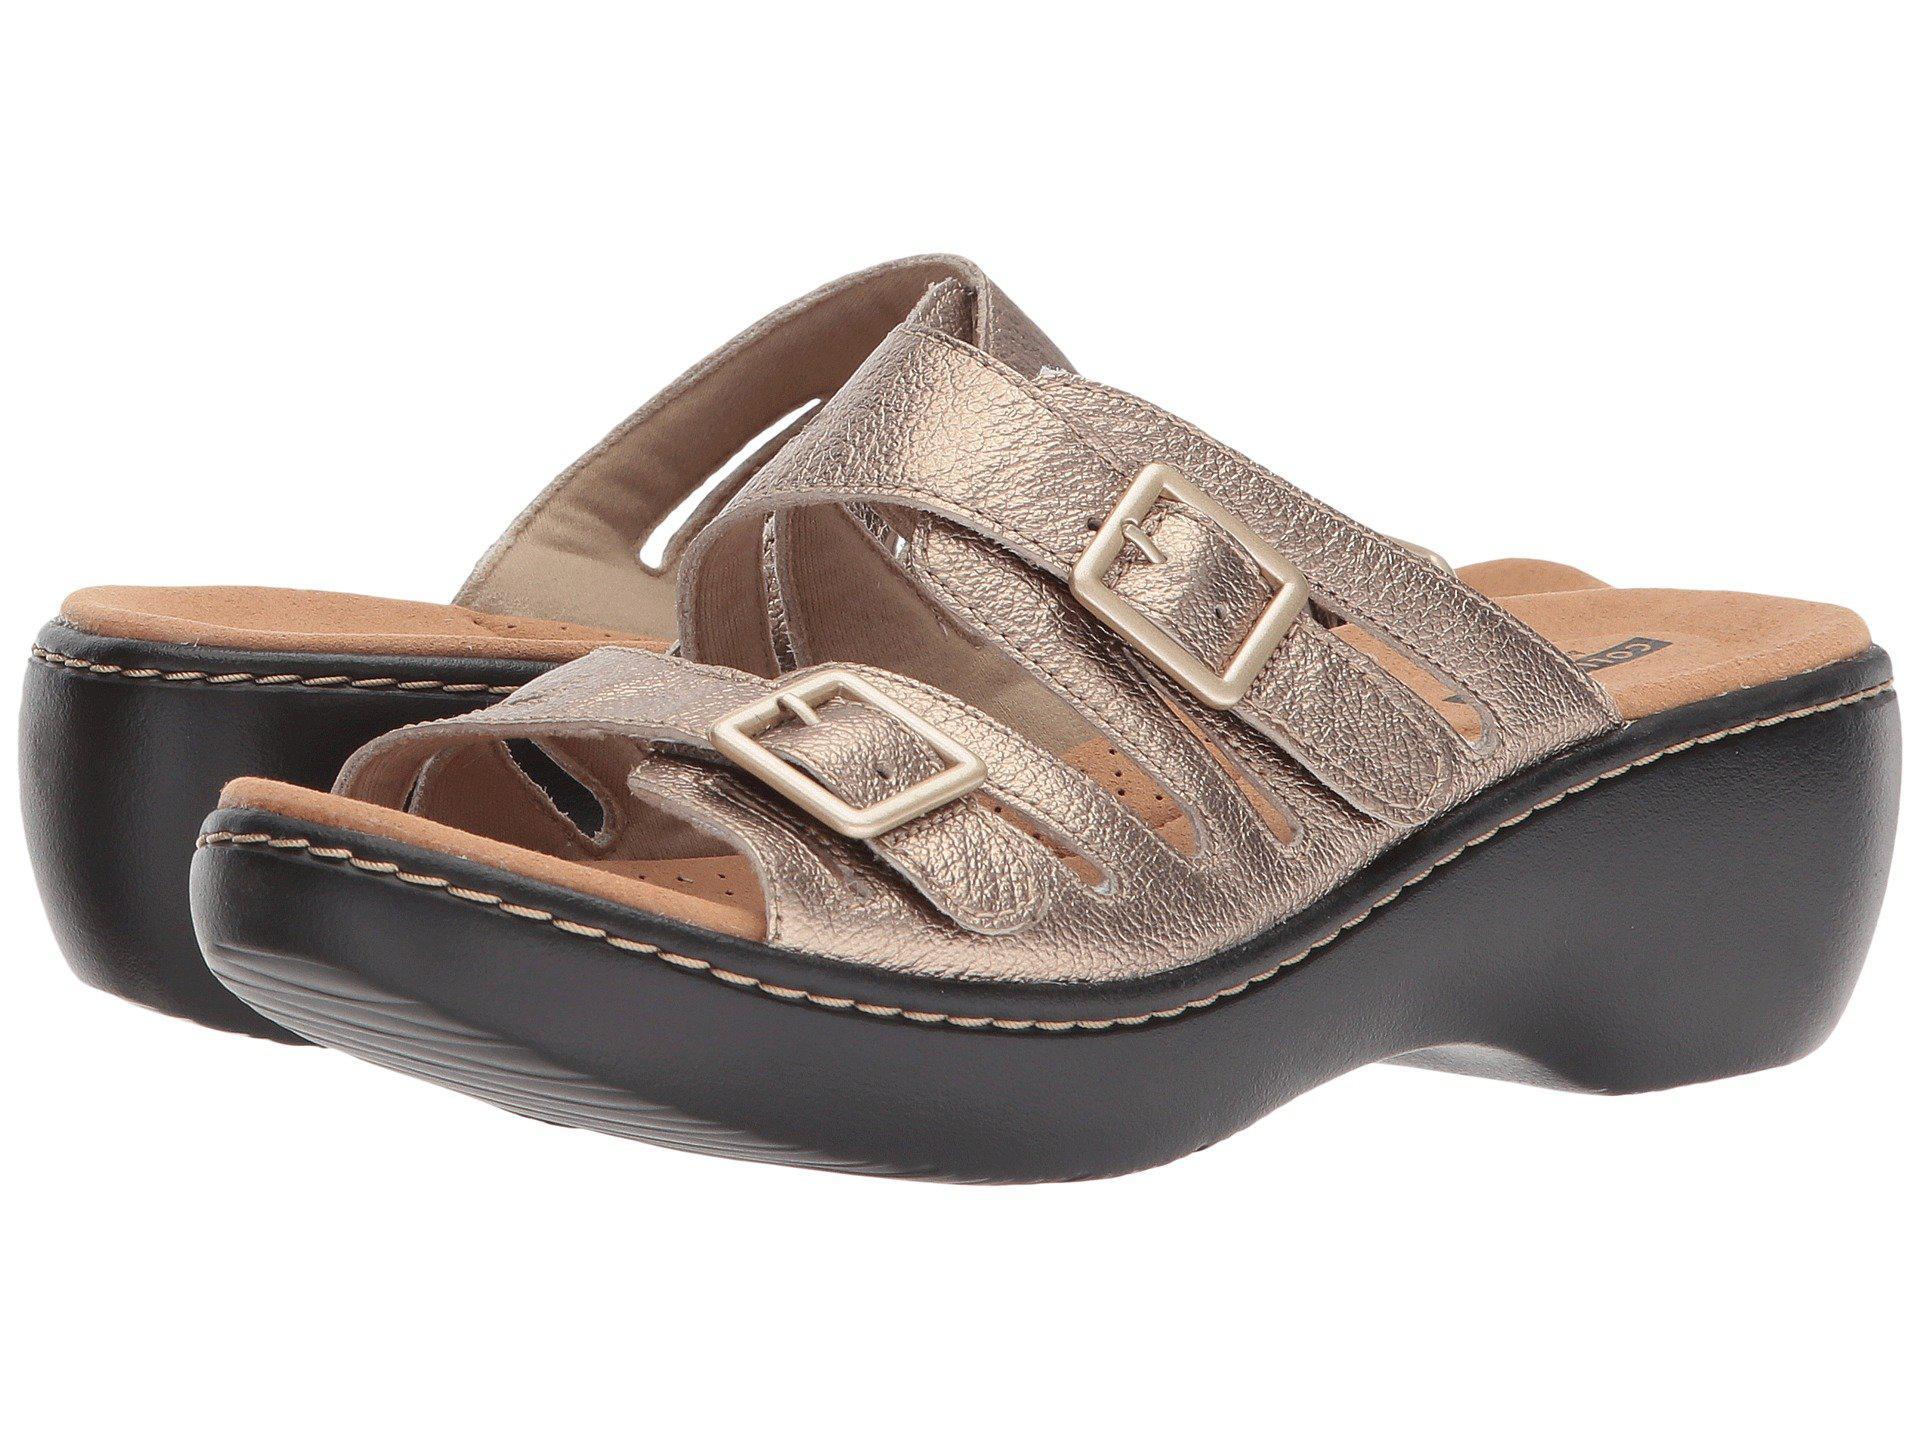 ac5db37ce81 Lyst - Clarks Delana Liri (dark Tan Leather) Women s Shoes - Save 7%